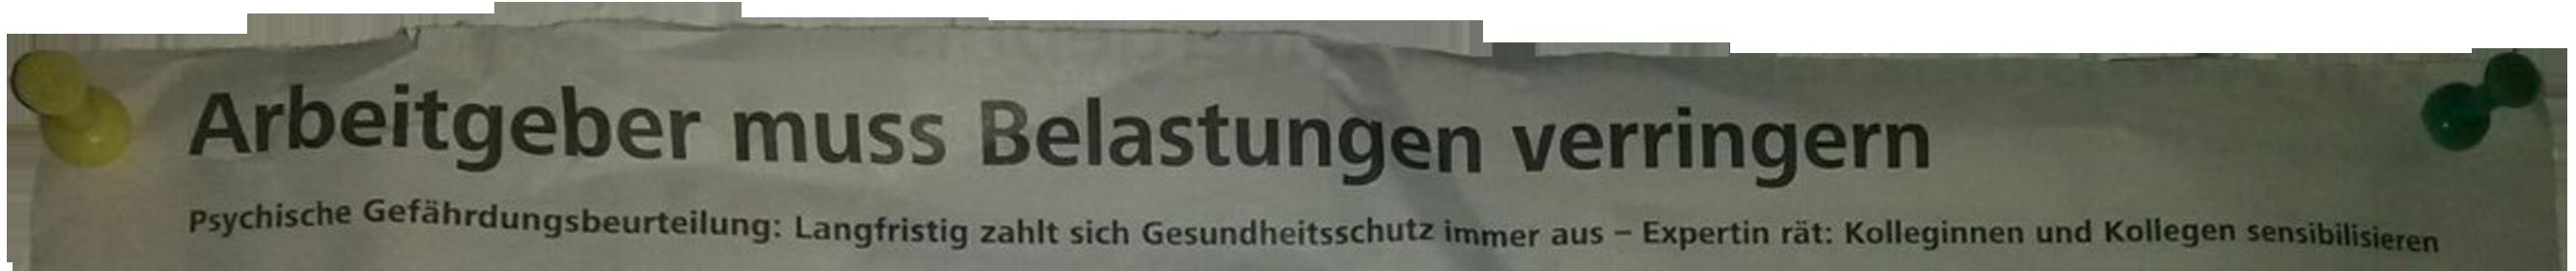 z2-headline-png